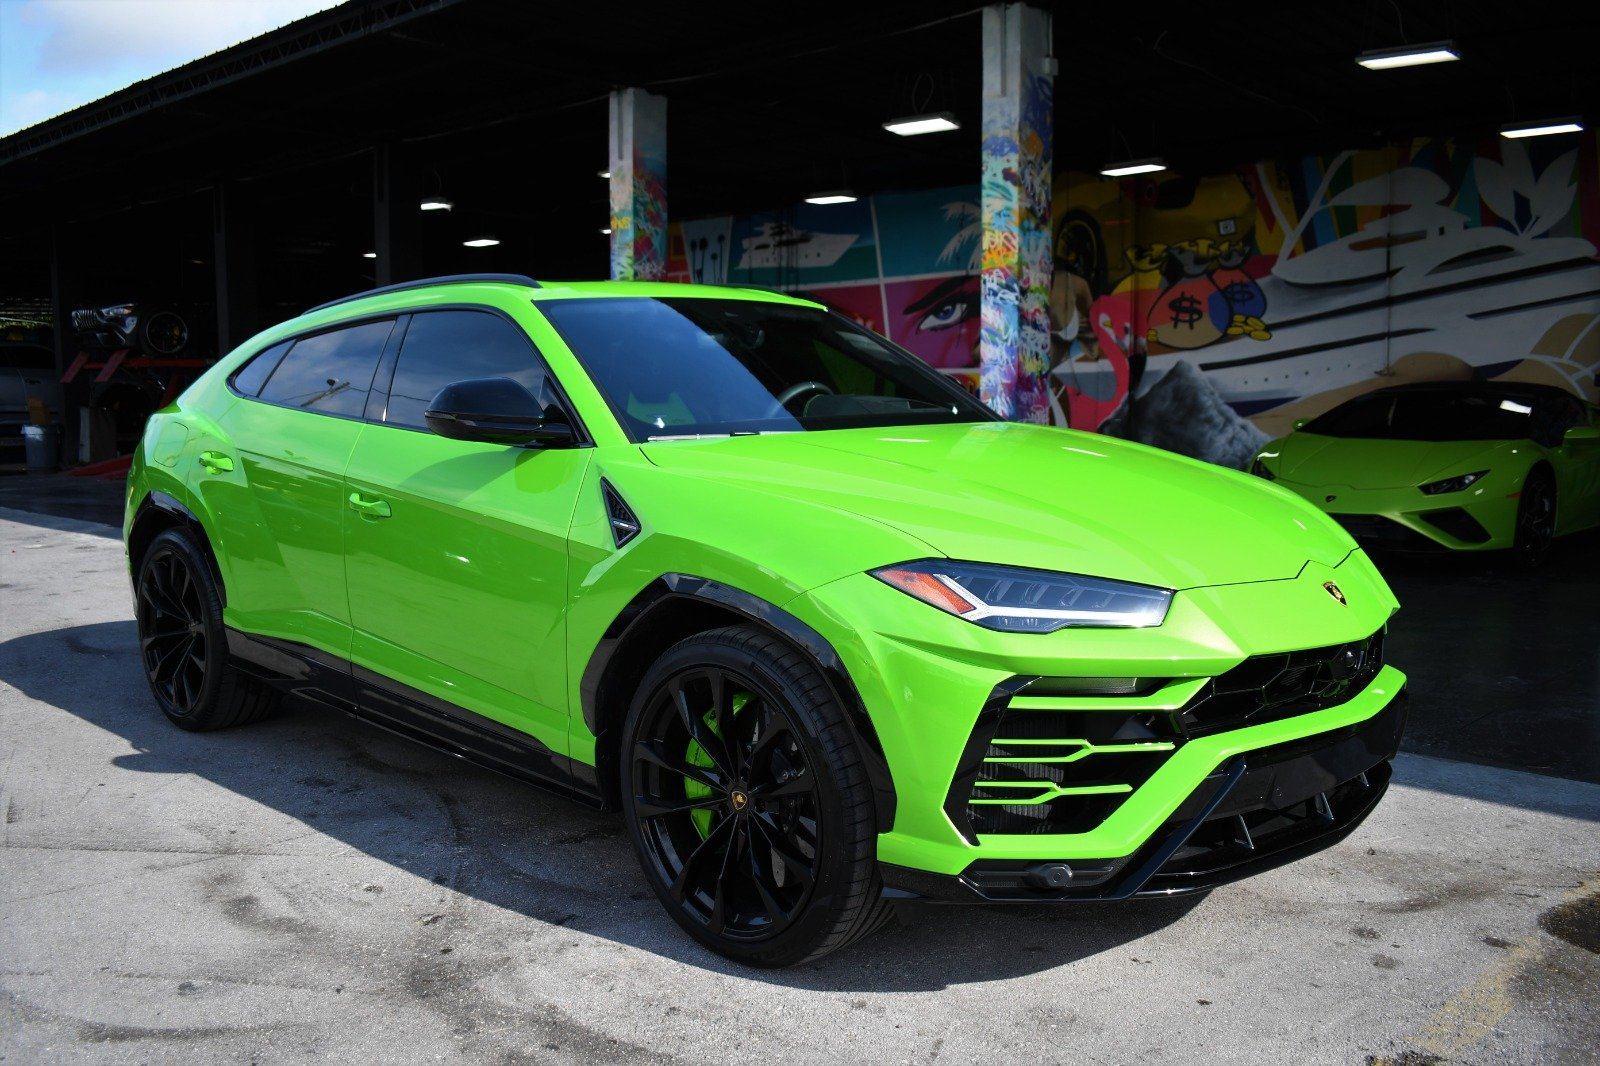 Image #9 of our  2022 Lamborghini Urus  Green    In Miami Fort Lauderdale Palm Beach South Florida